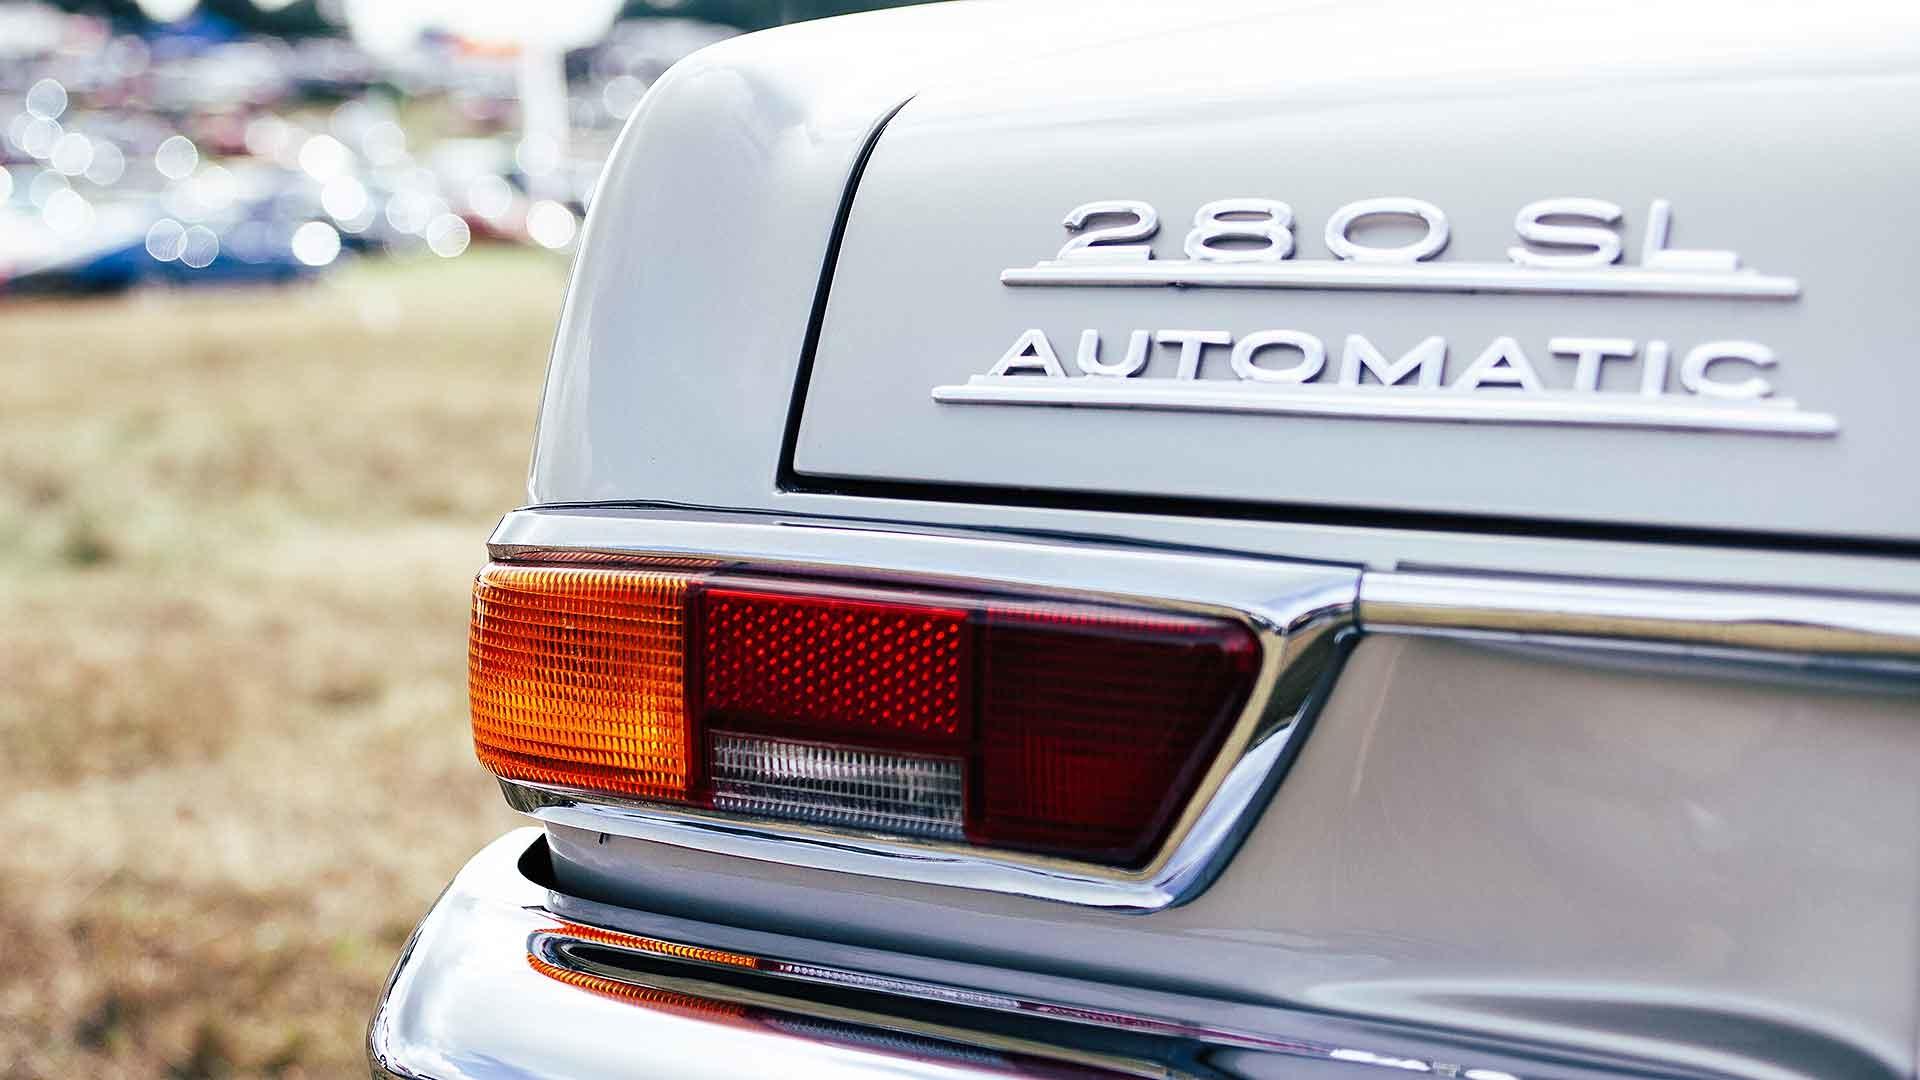 Retro Mercedes-Benz 280 SL Automatic